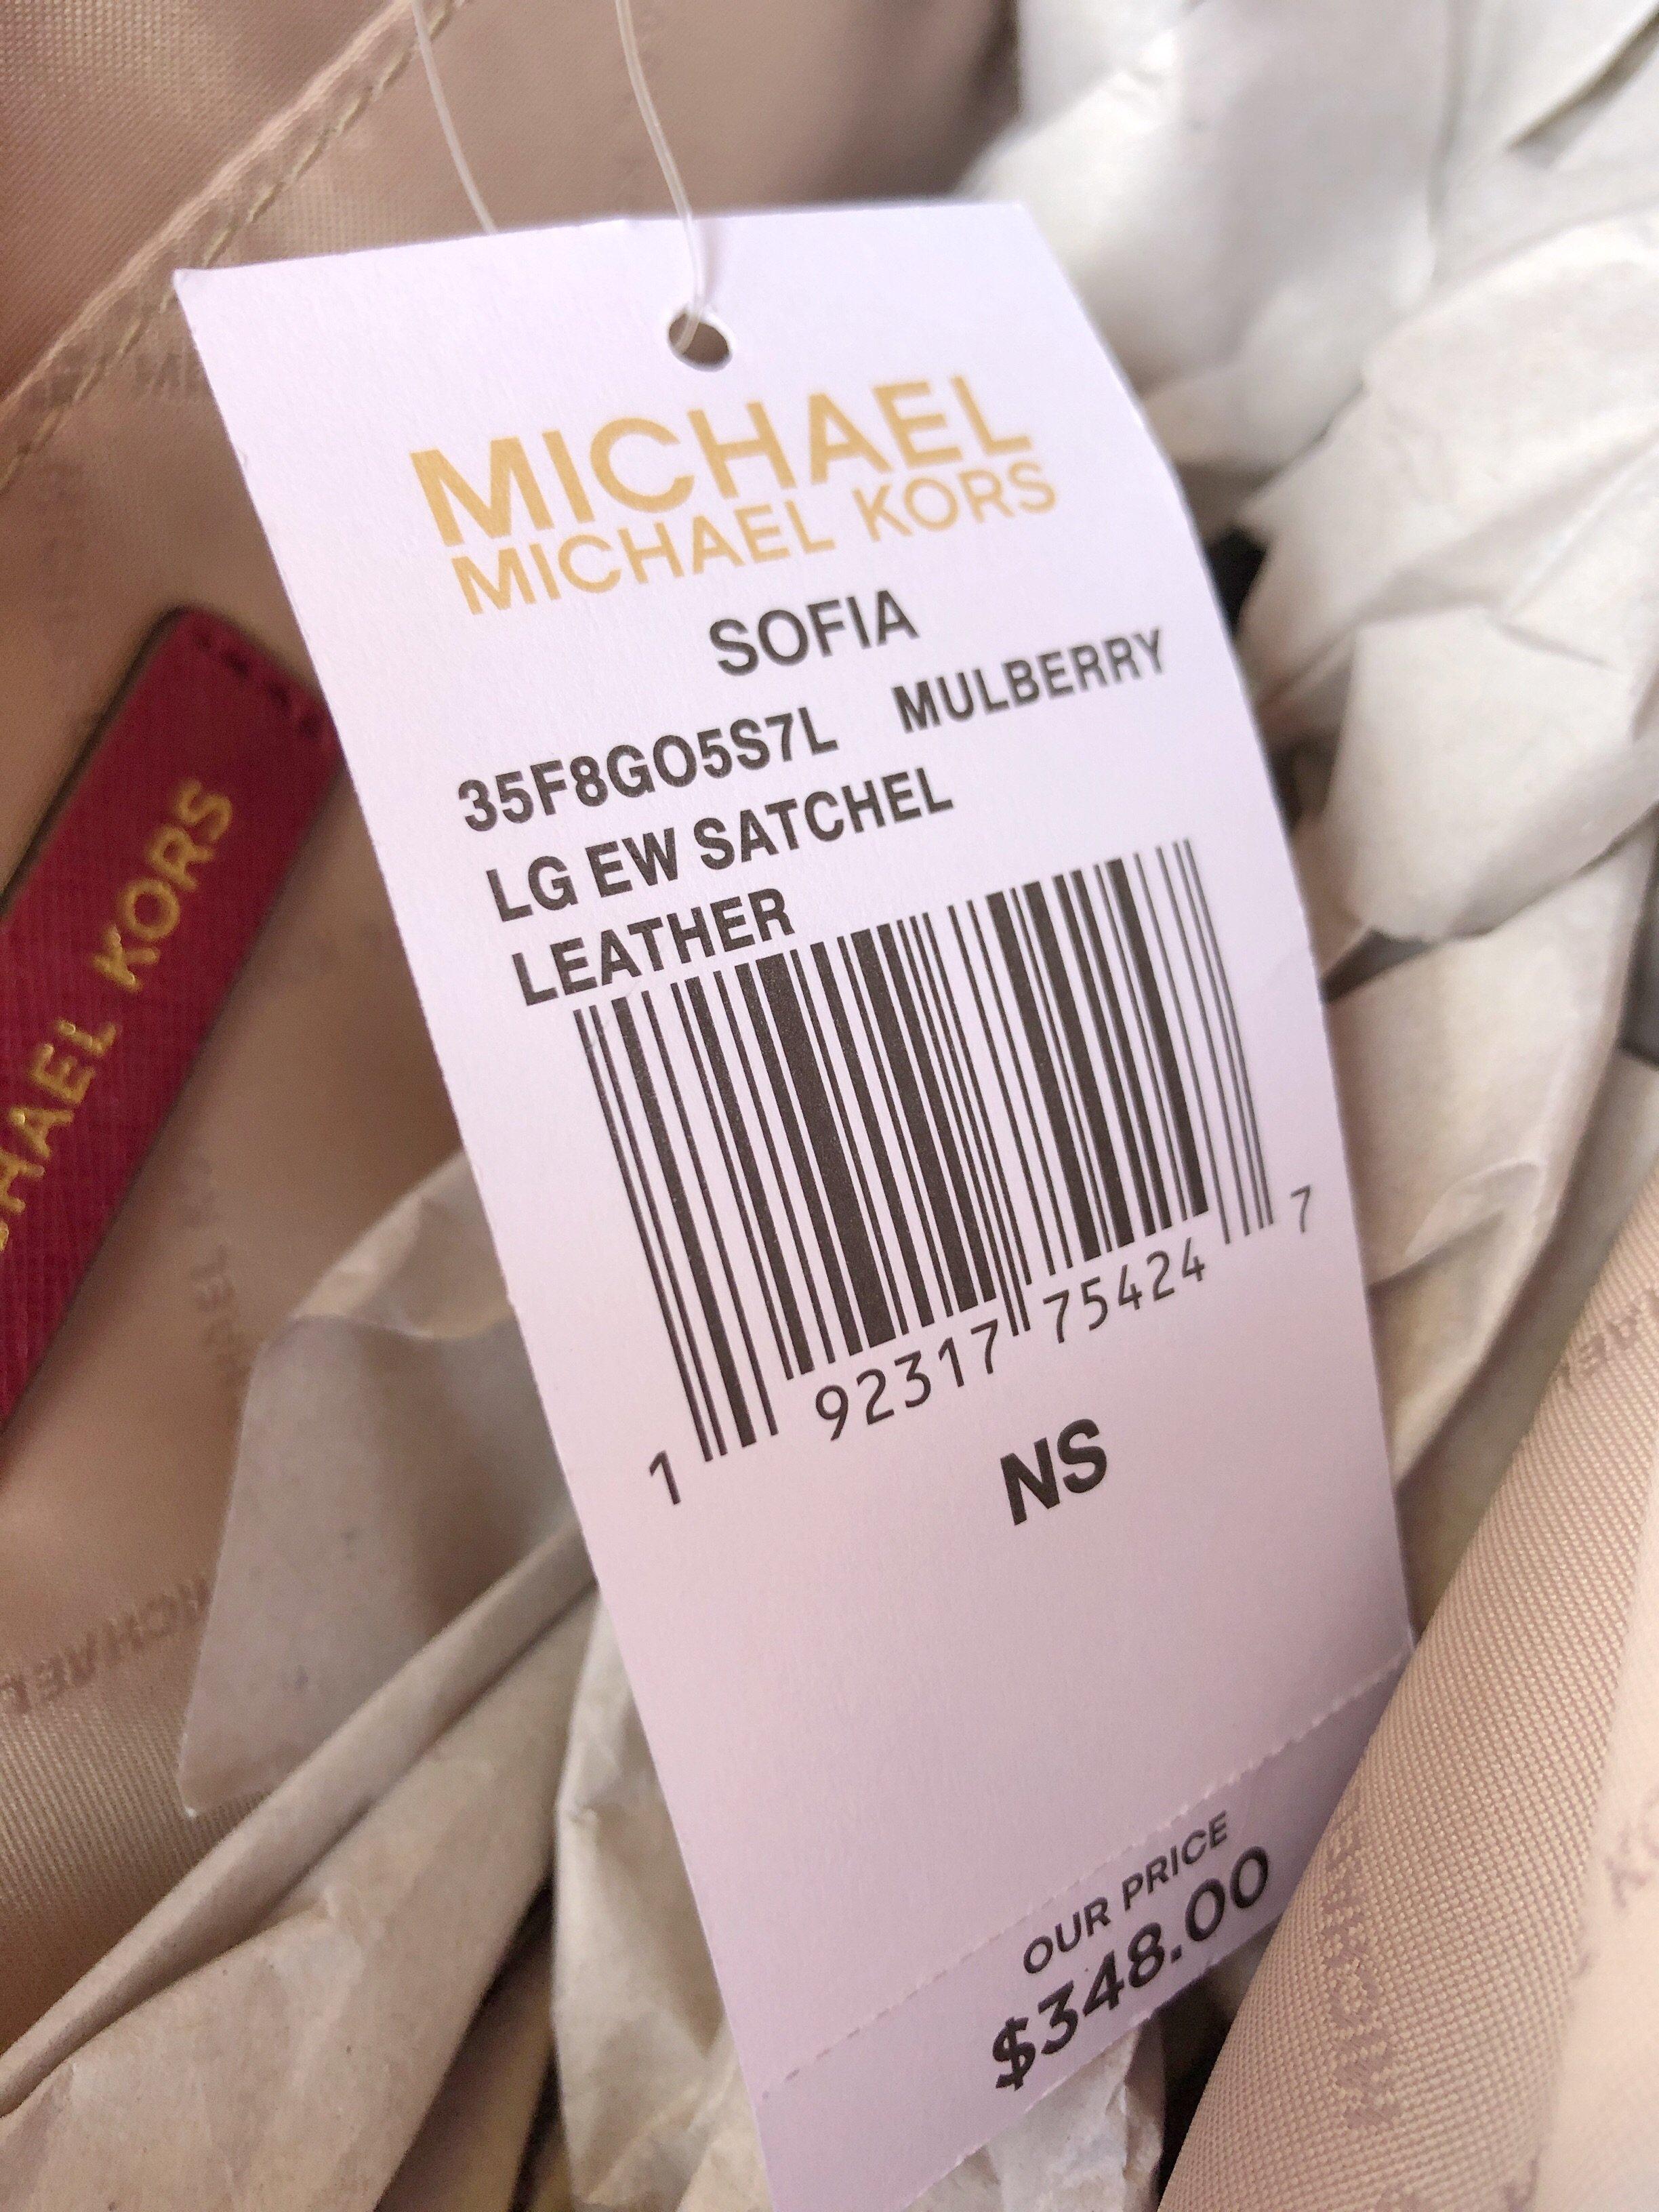 cd9a9ab045cd55 Michael Kors Sofia Portia Large East West Satchel Crossbody Mulberry ...